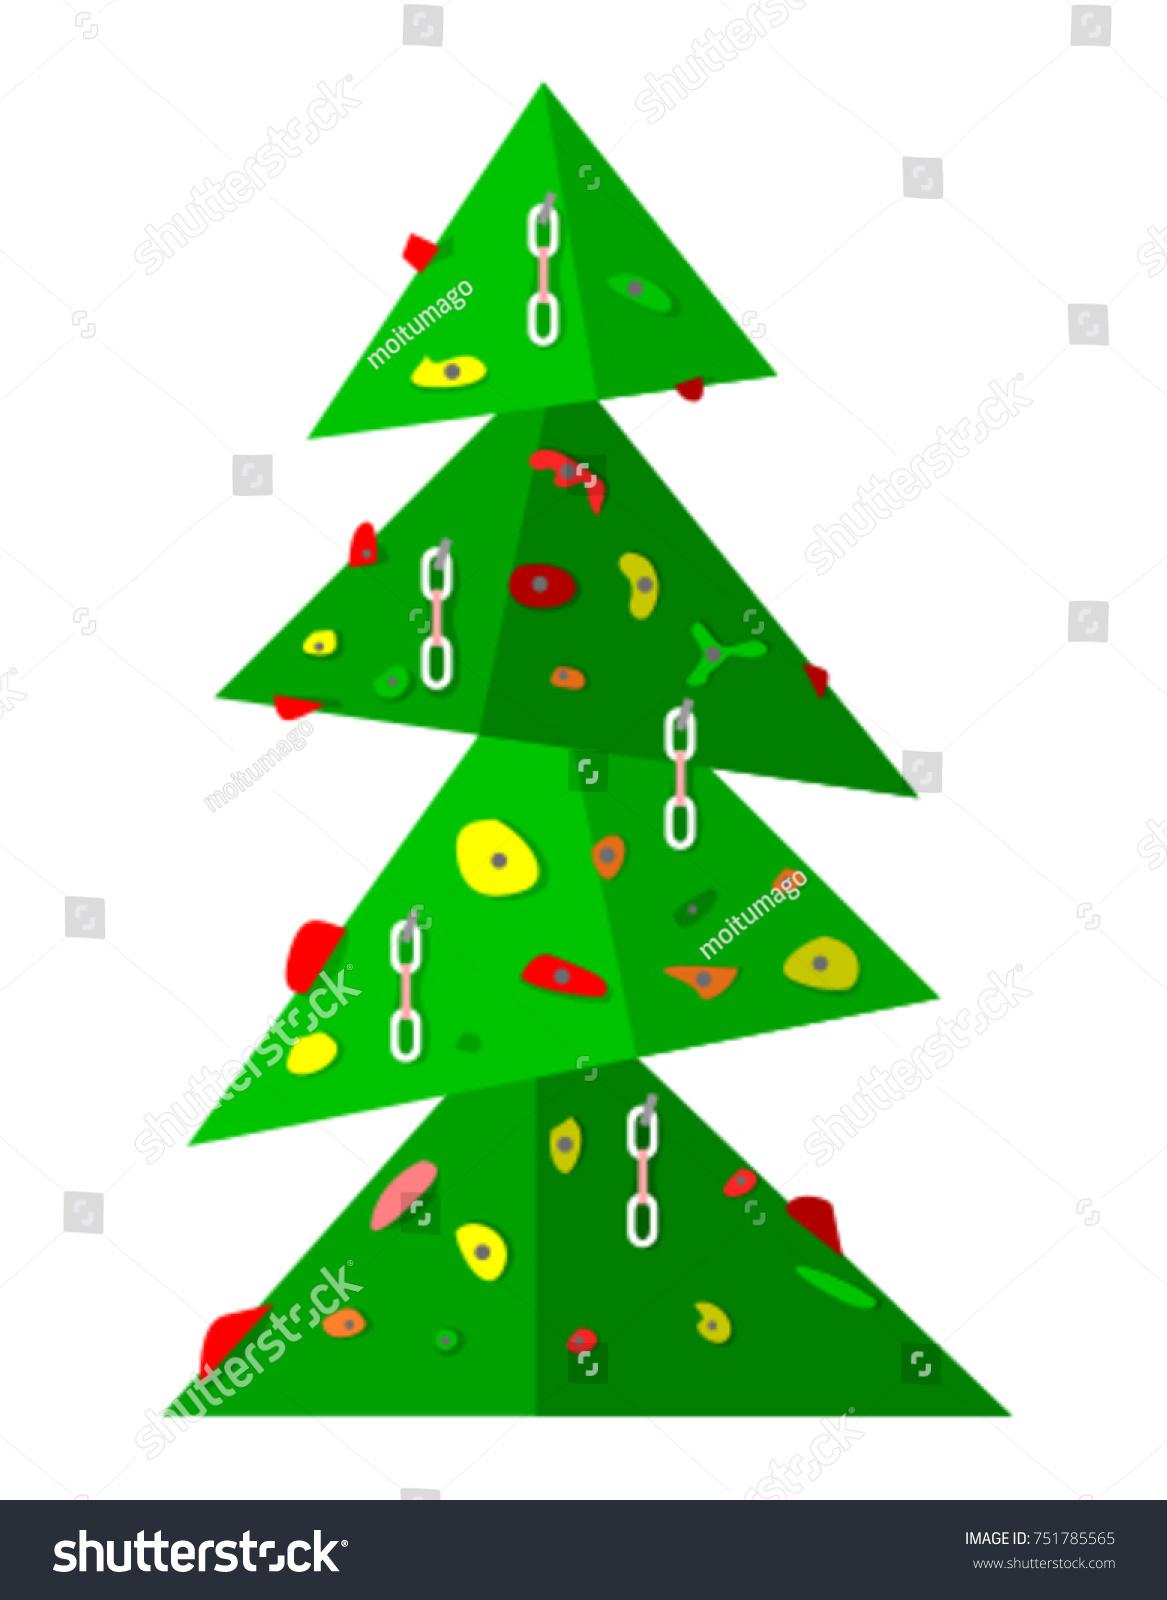 Christmas Tree Form Green Rock Climbing Stock Vector 751785565 ...